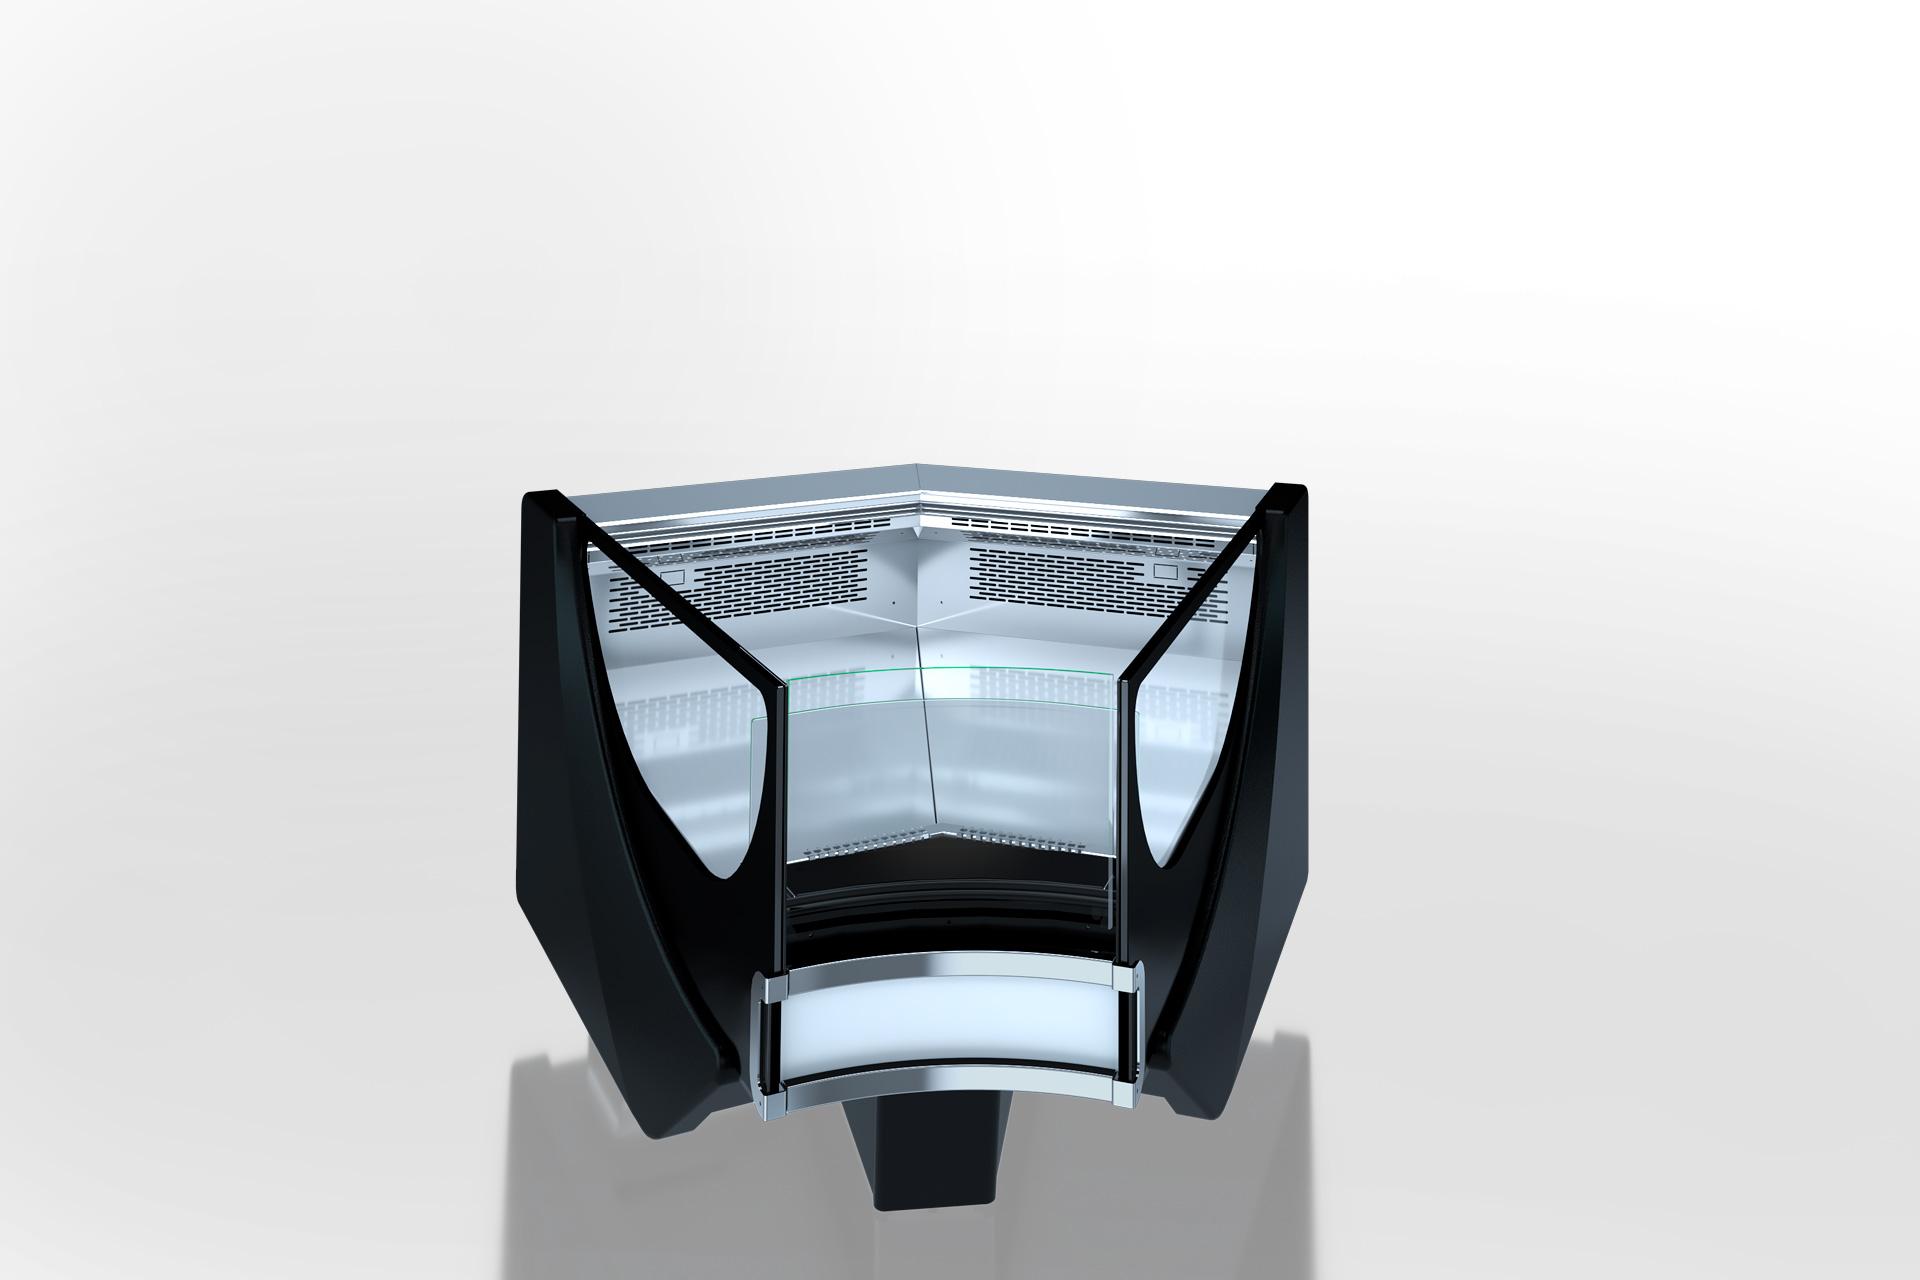 Kühlvitrinen Missouri cold diamond MC 126 deli self 084 DLM IR45